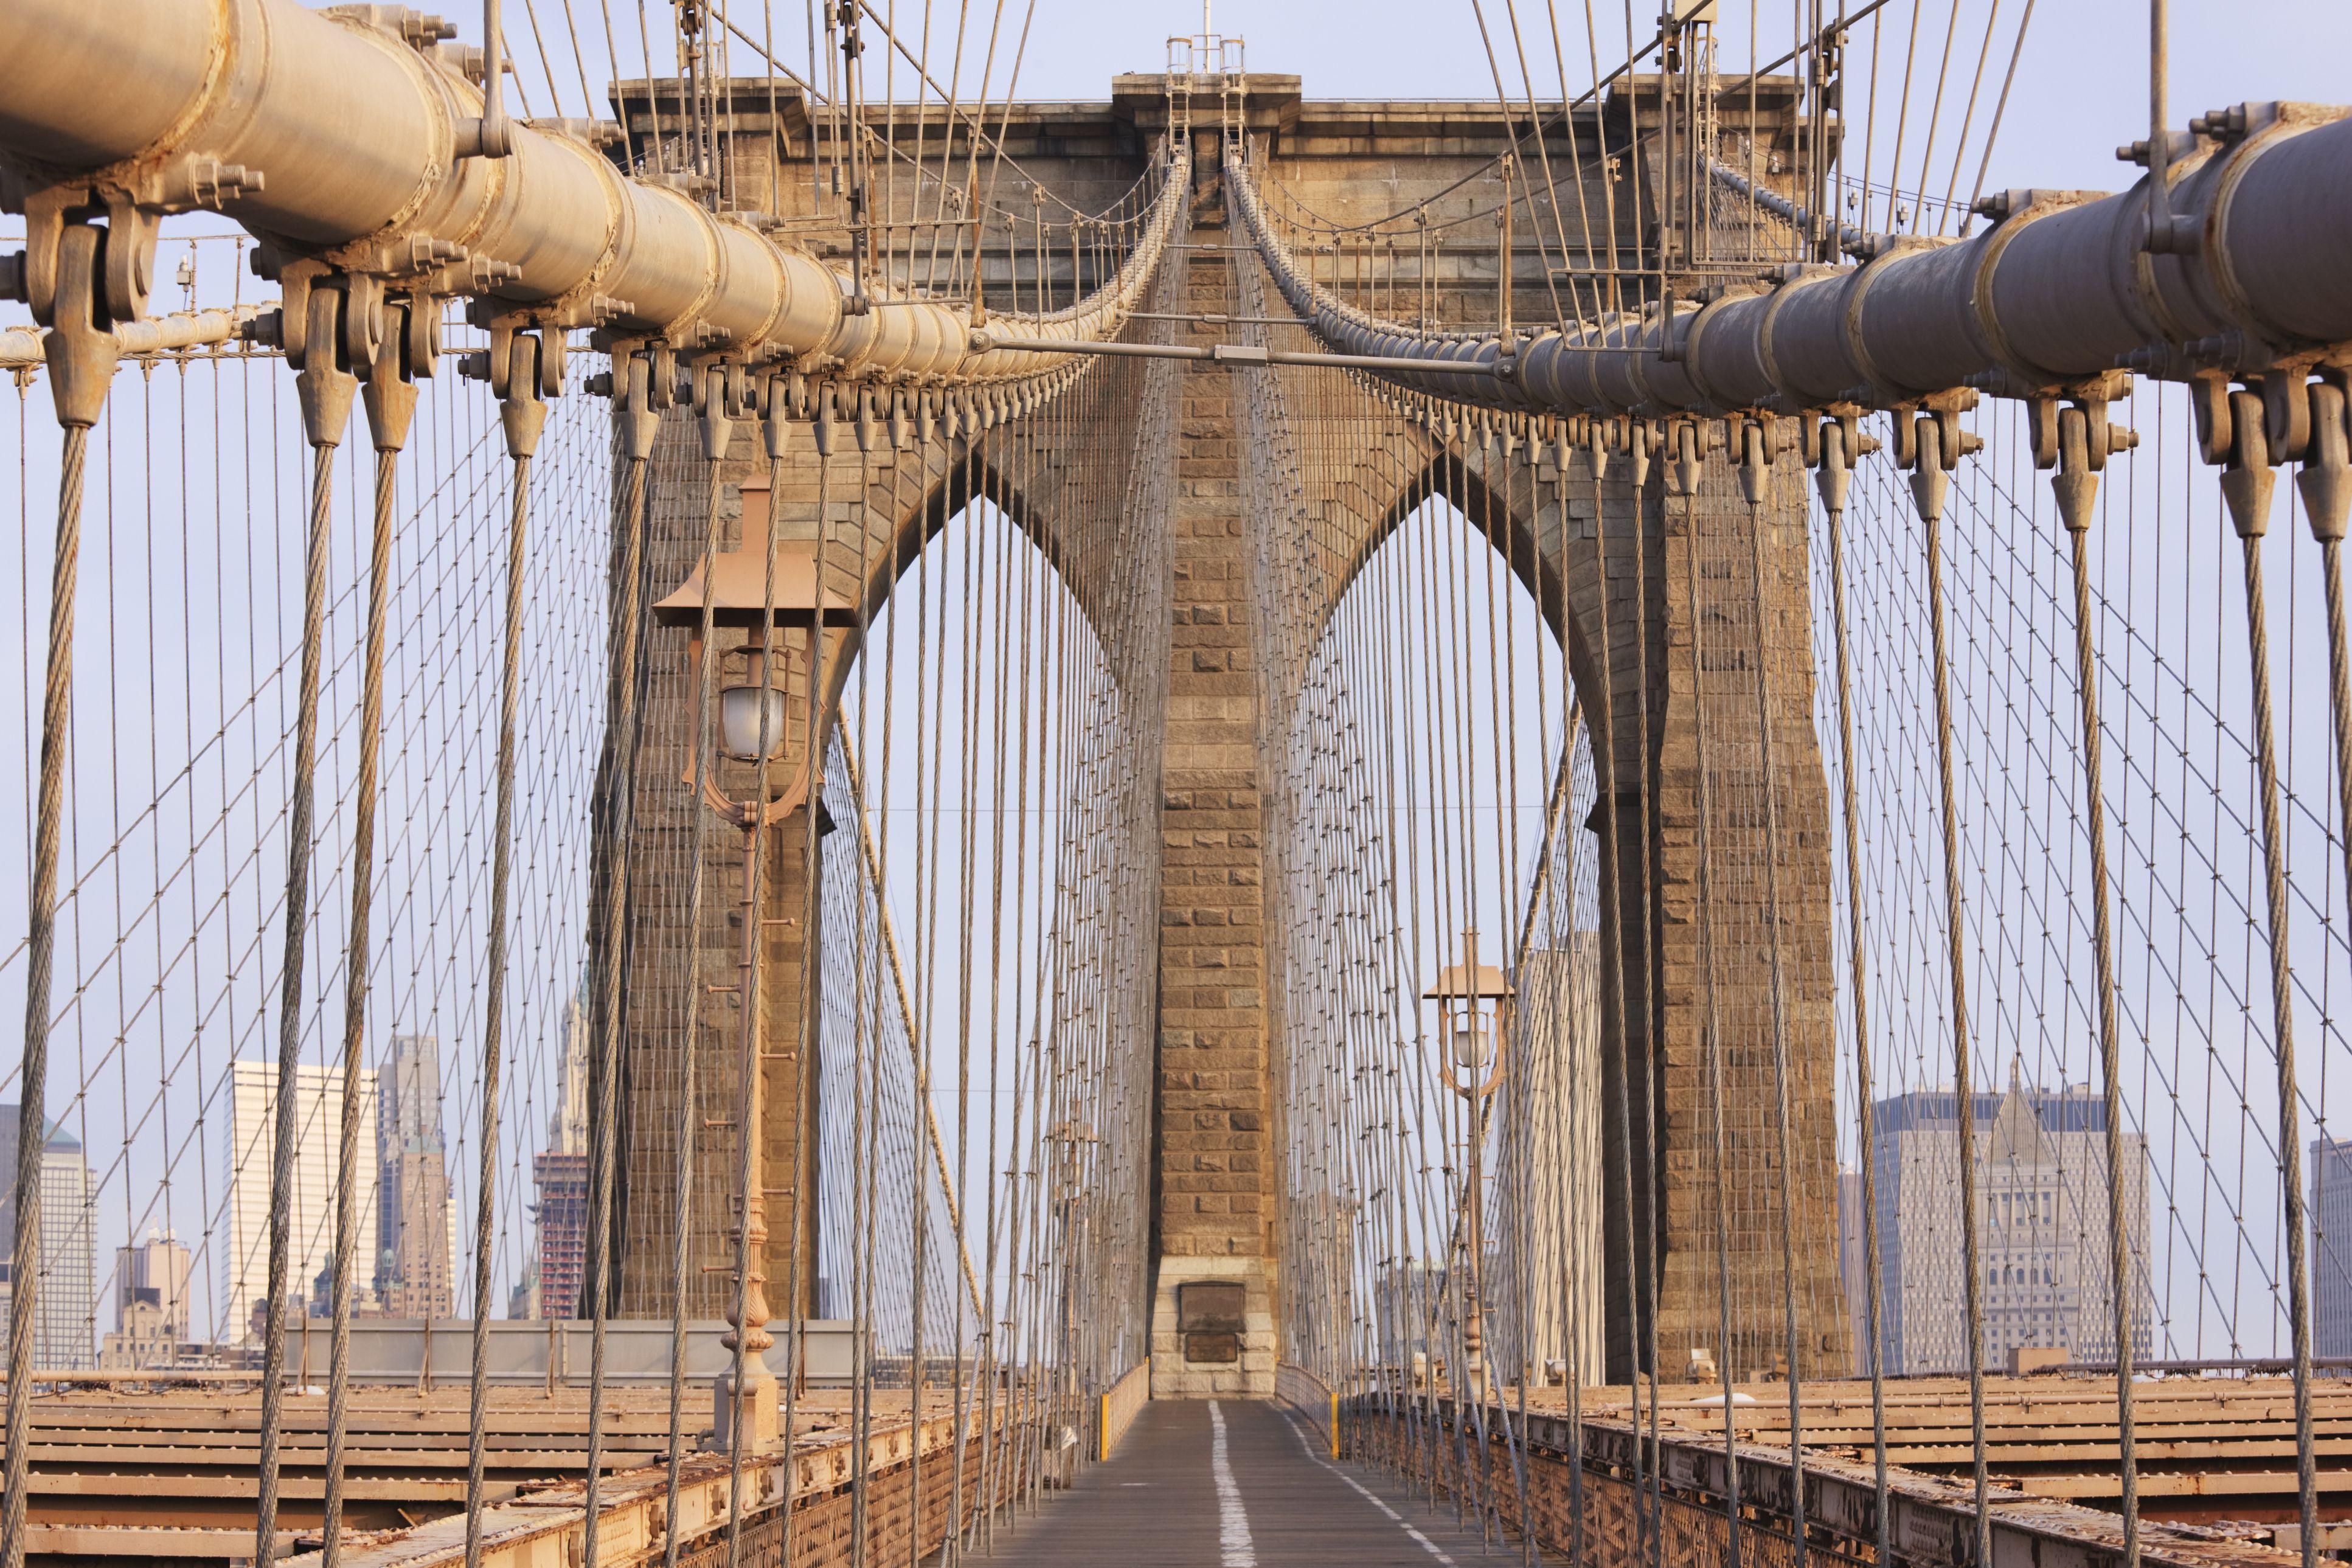 Pedestrian Level of the Brooklyn Bridge, New York City, pedestrian point of view